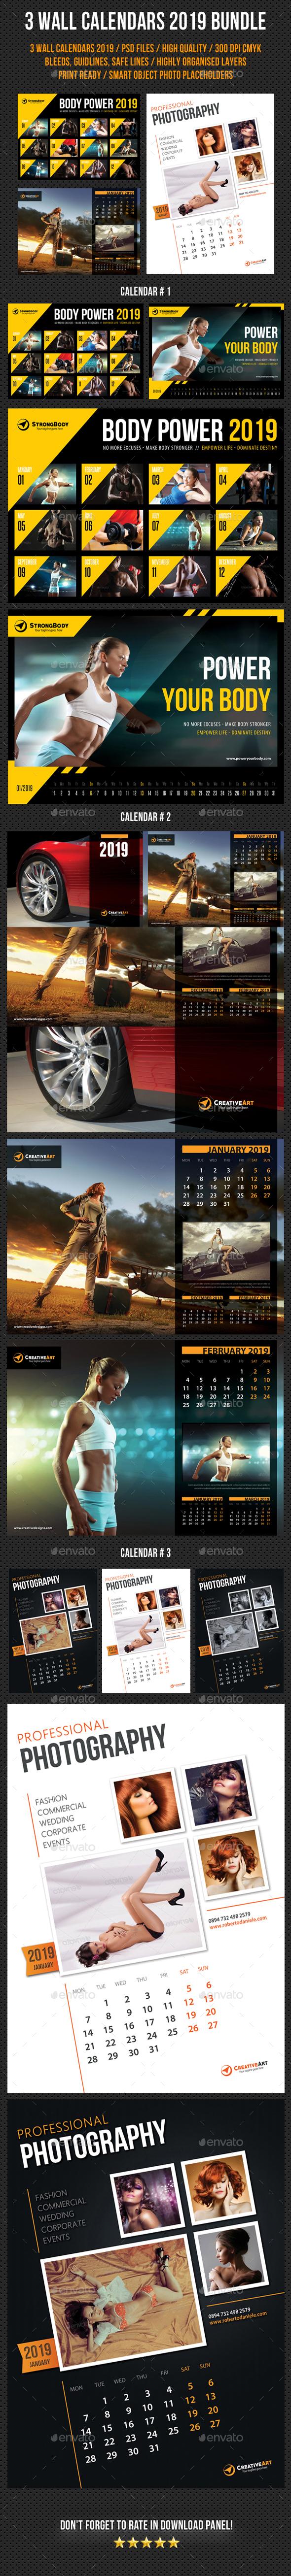 Wall Calendars 2019 Bundle V03 - Calendars Stationery